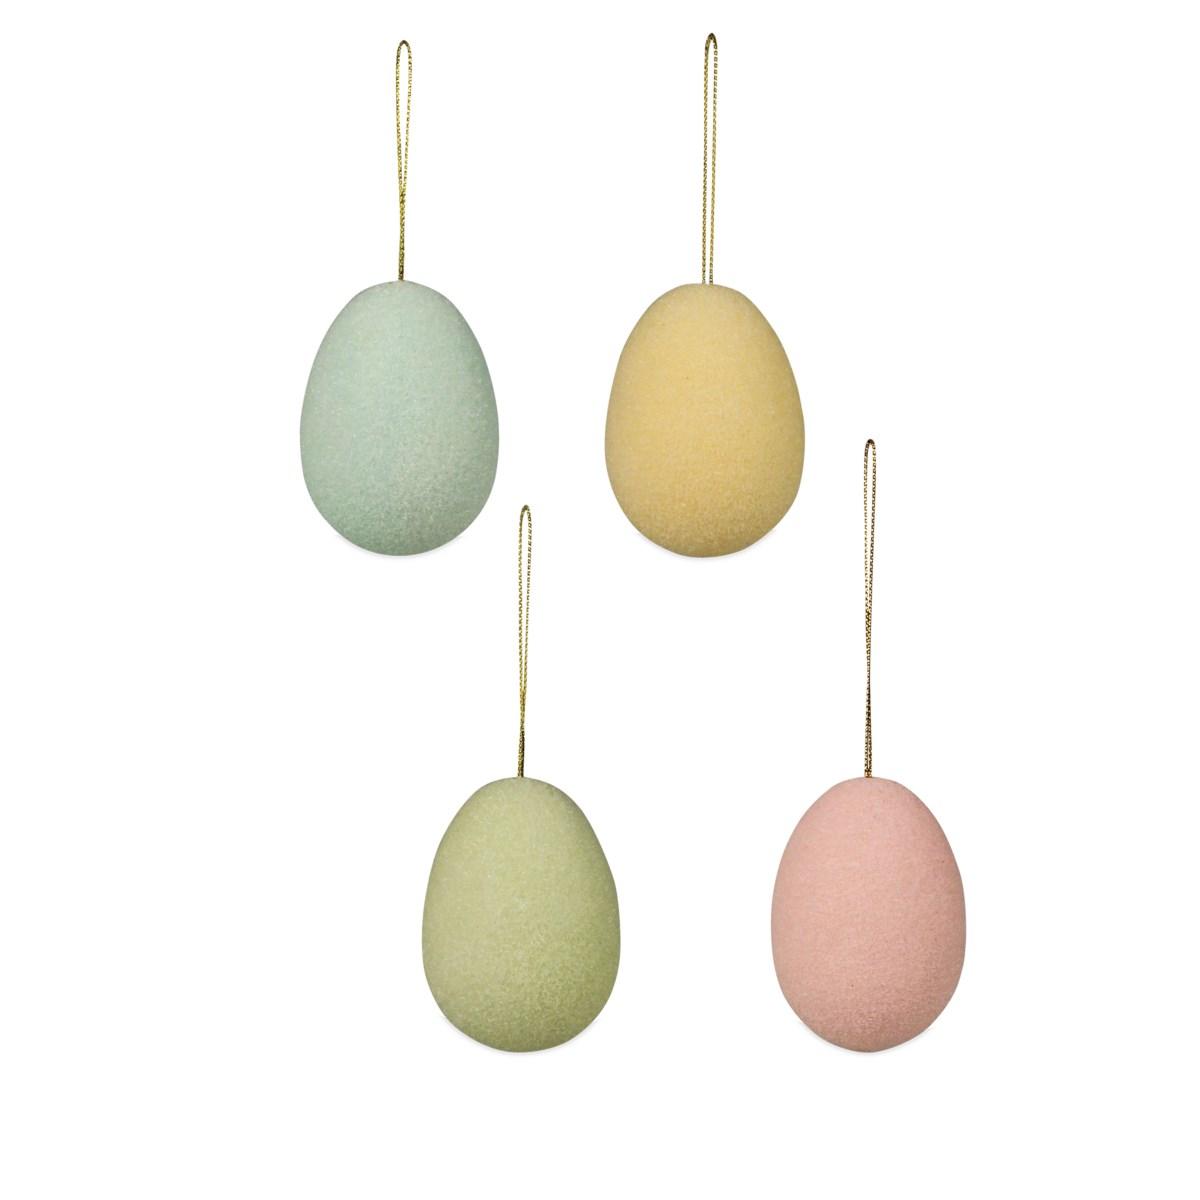 Pastel Flocked Egg Ornament Medium 4A